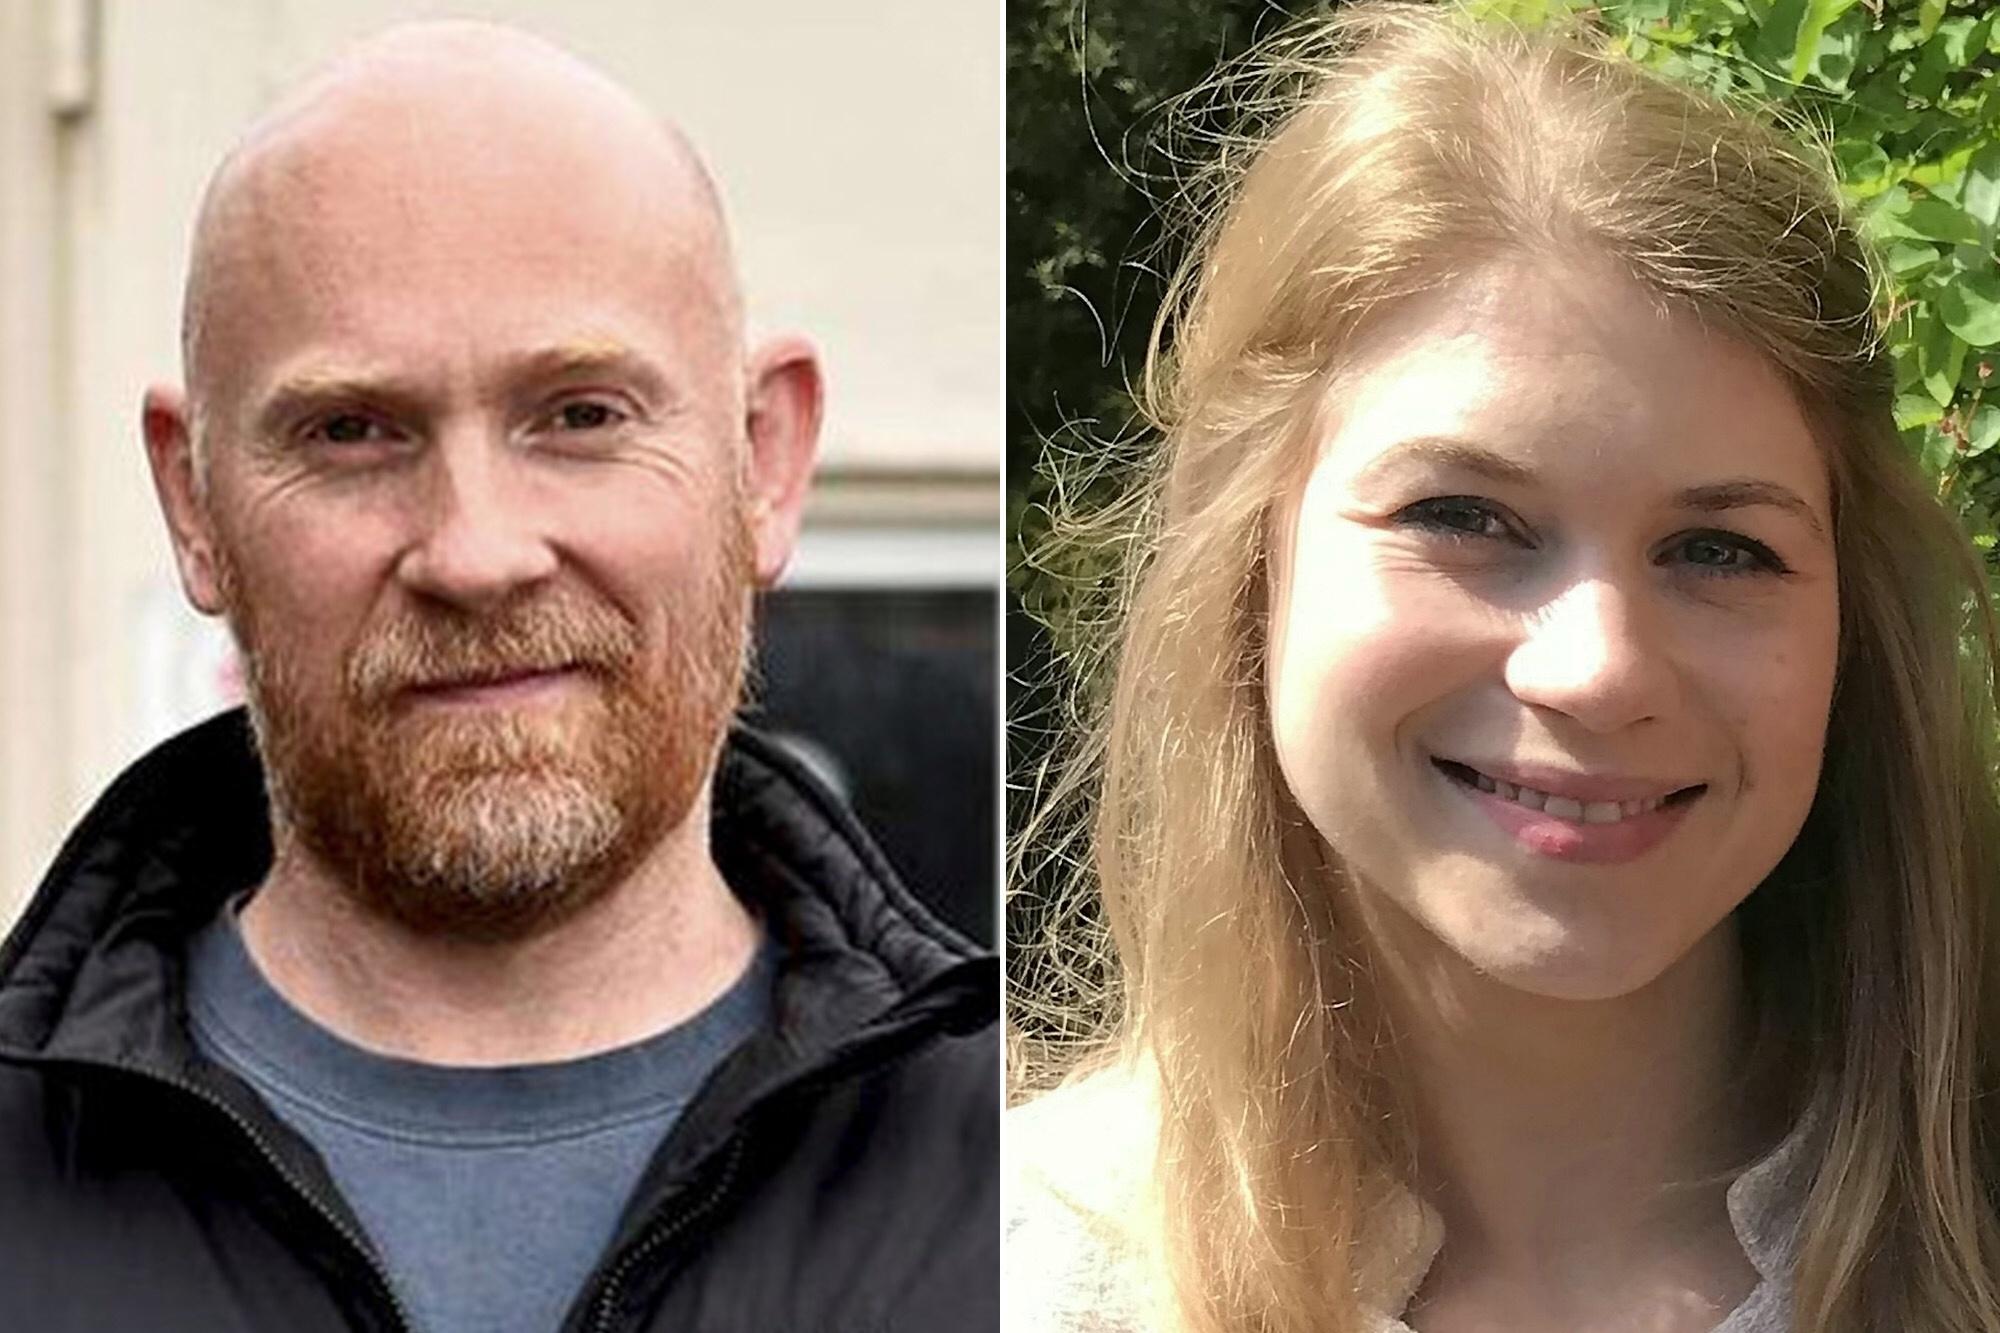 Wayne Couzens admits to kidnapping and raping Sarah Everard